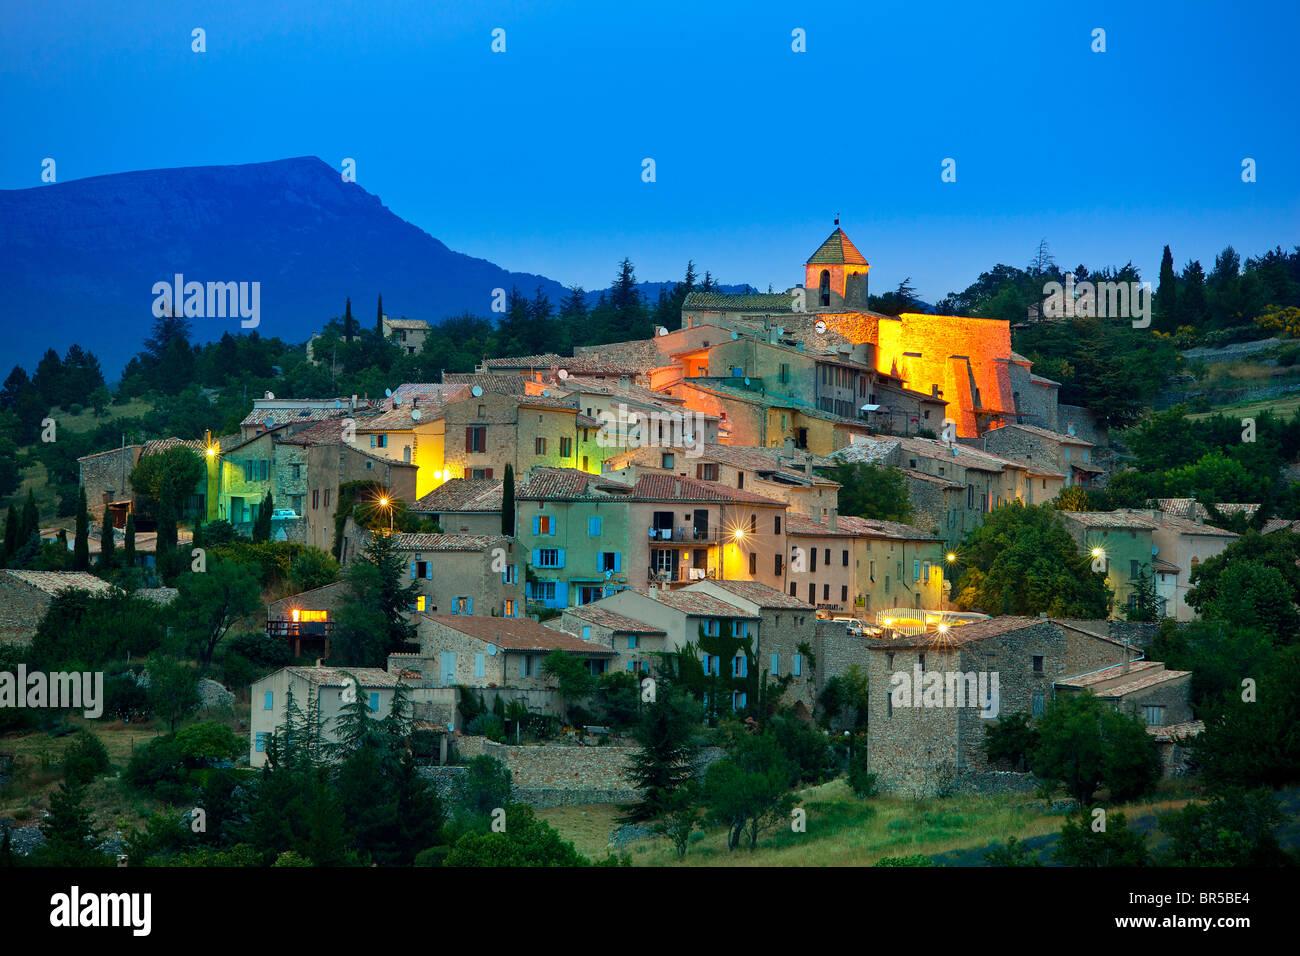 Europe, France, Vaucluse (84), perched village of Aurel - Stock Image